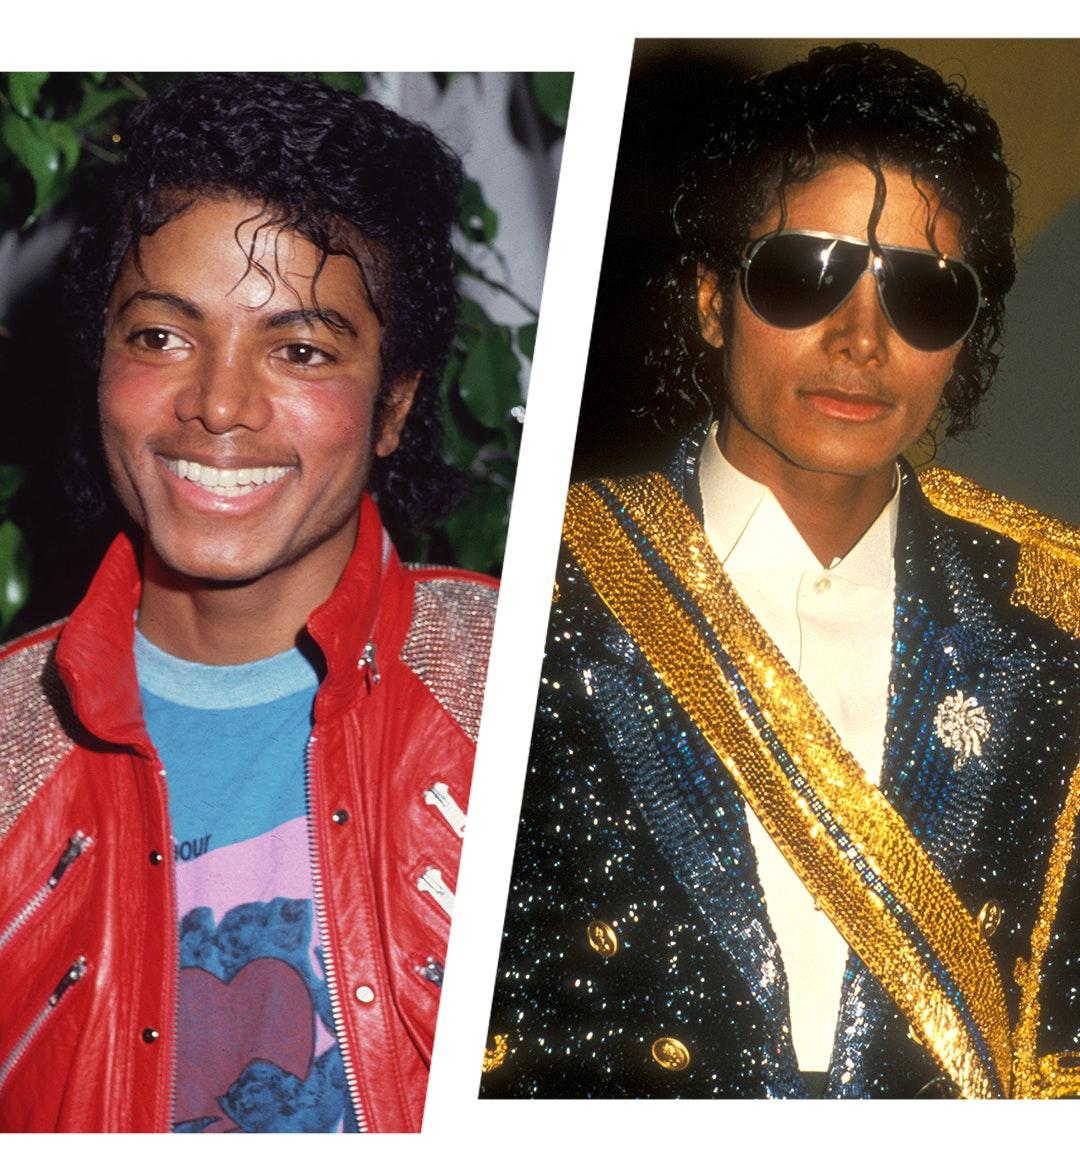 MJ mobile